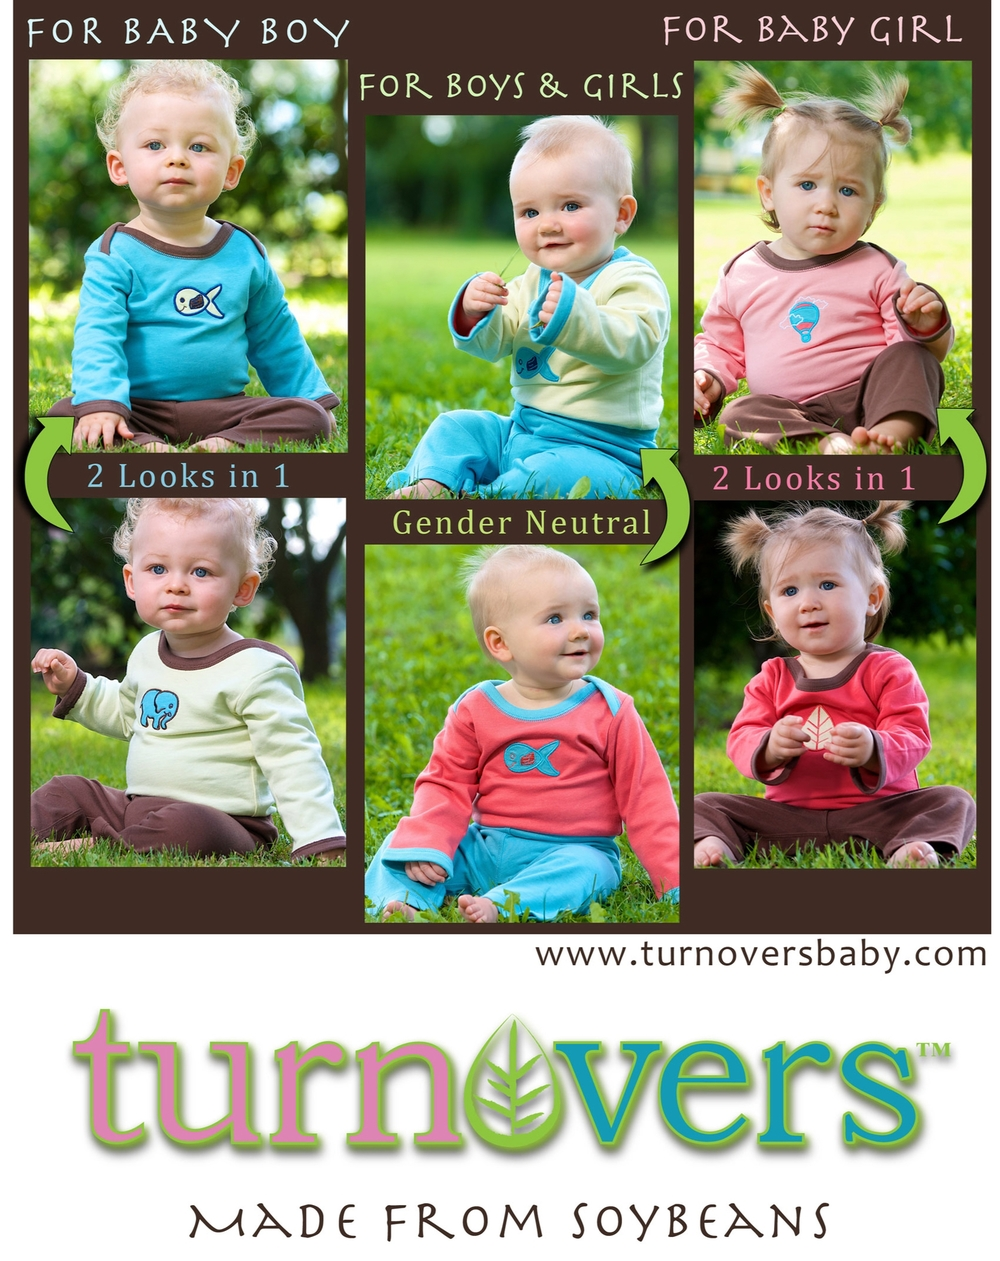 Visit www.TurnoversBabyShop.com